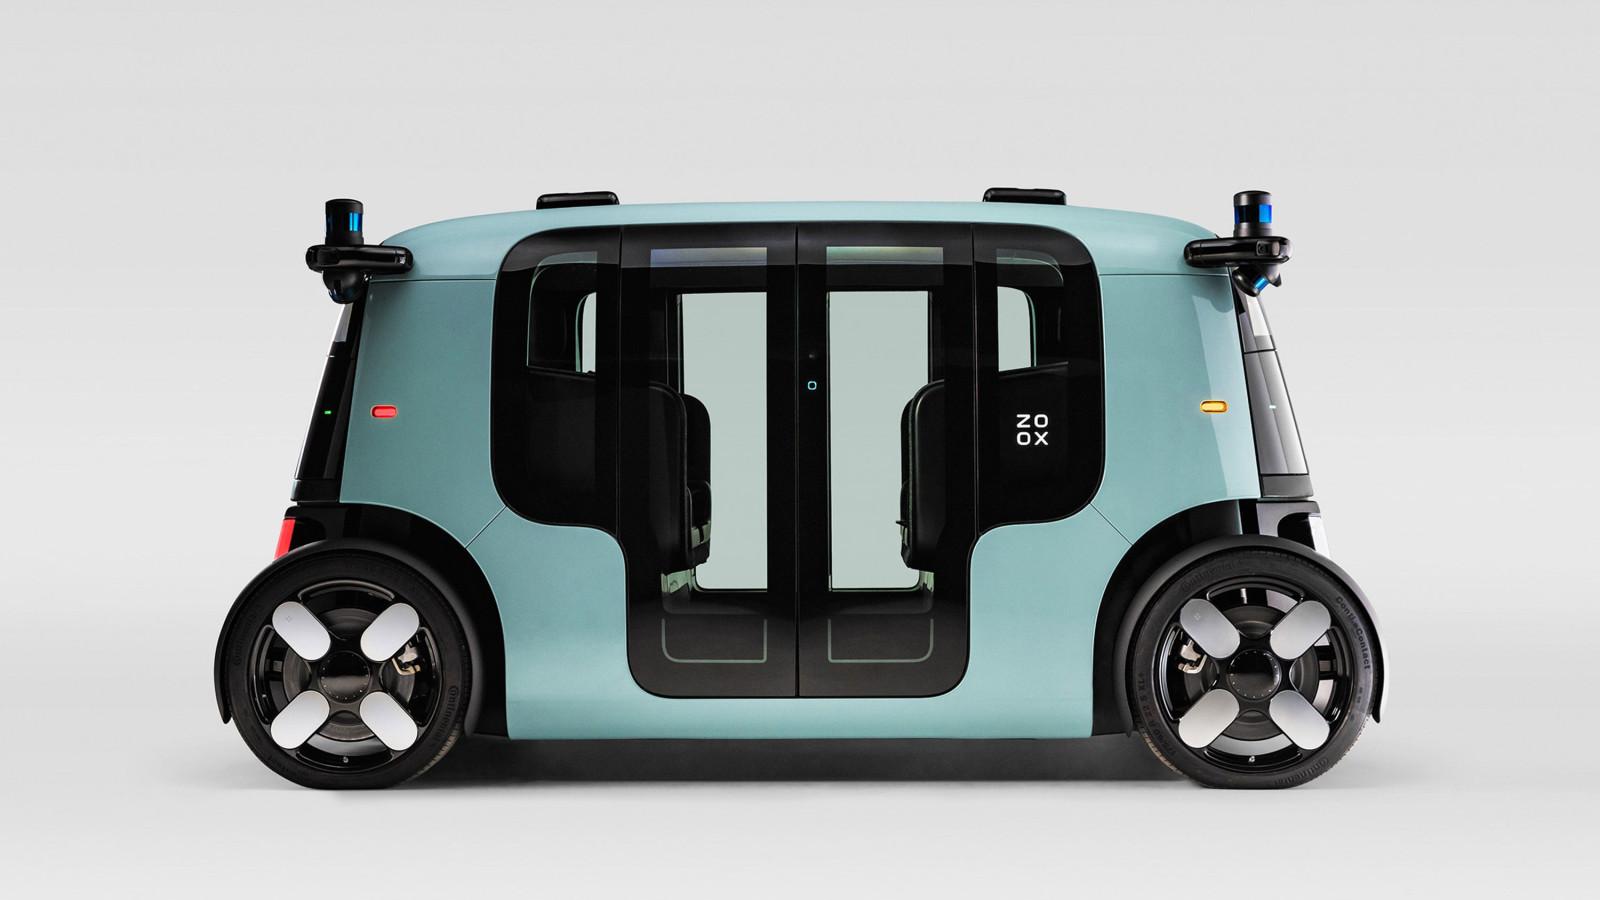 So sieht das selbstfahrende Auto Zoox aus